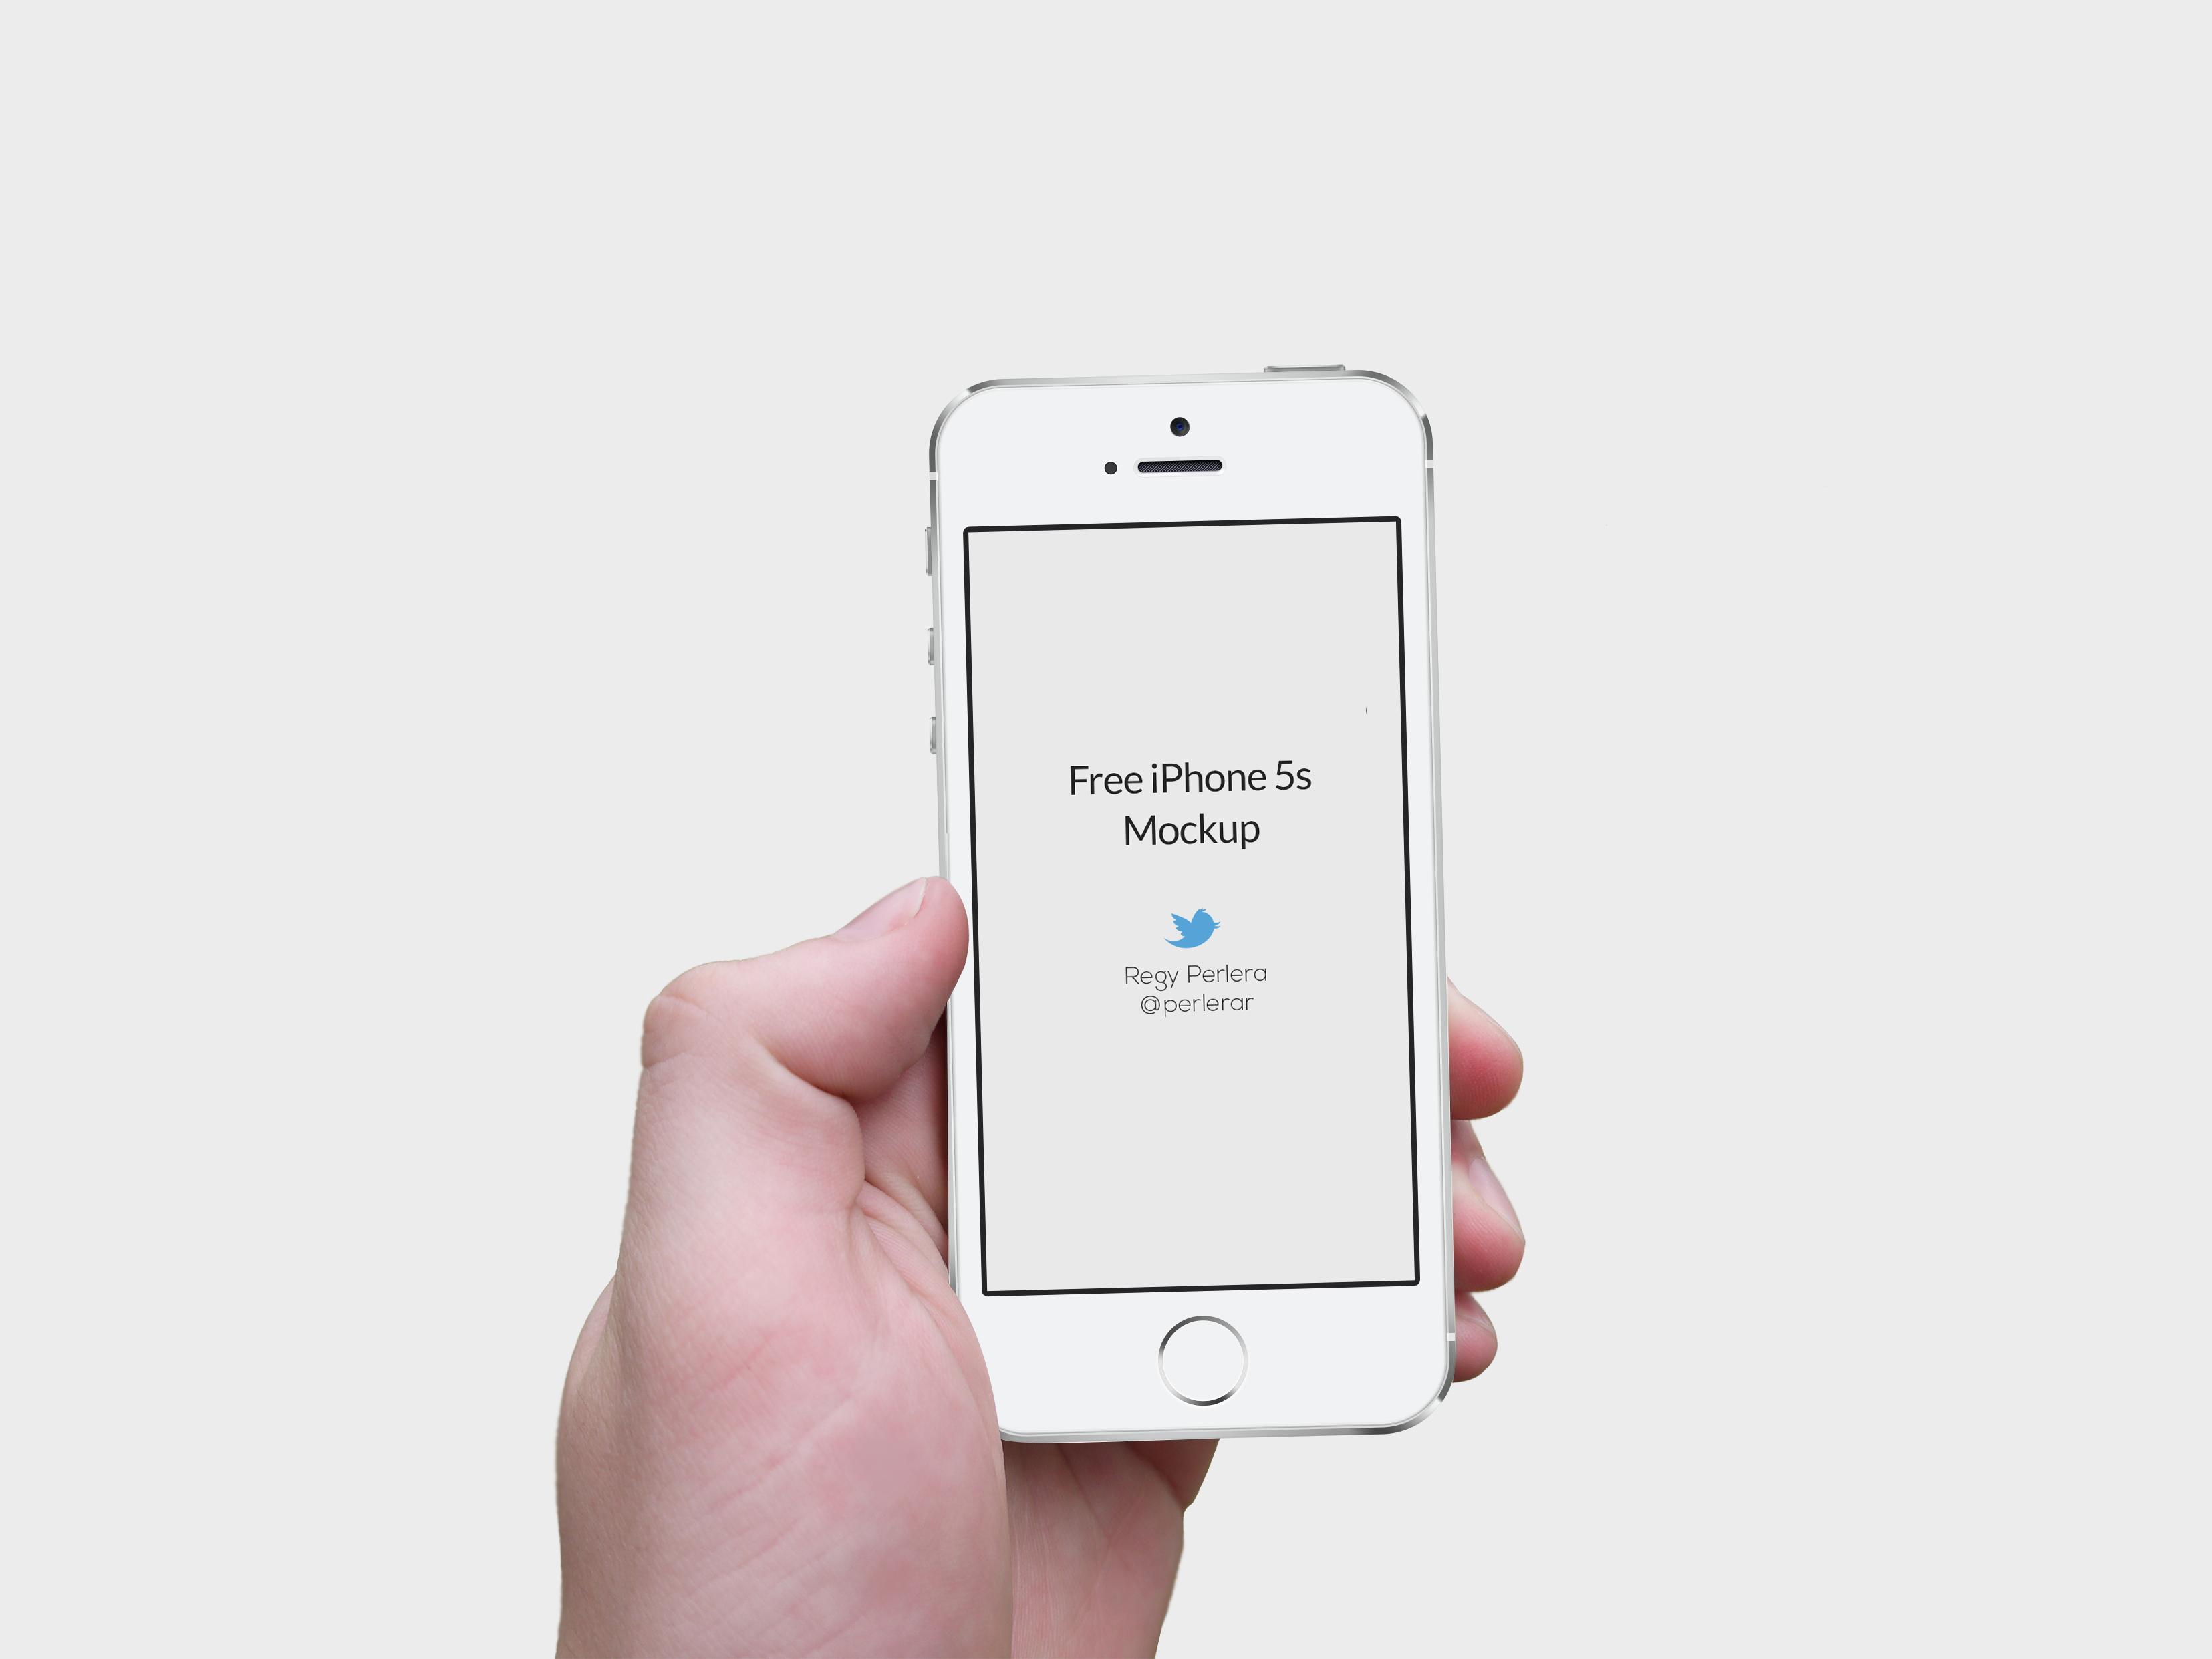 Download Ipad And Iphone 5s Mockups Template Psd Http Www Dailyfreepsd Com Psd Psd Mockup Template Ipad Iphone 5s Mockups Template Ps Iphone Iphone Design Iphone 5s